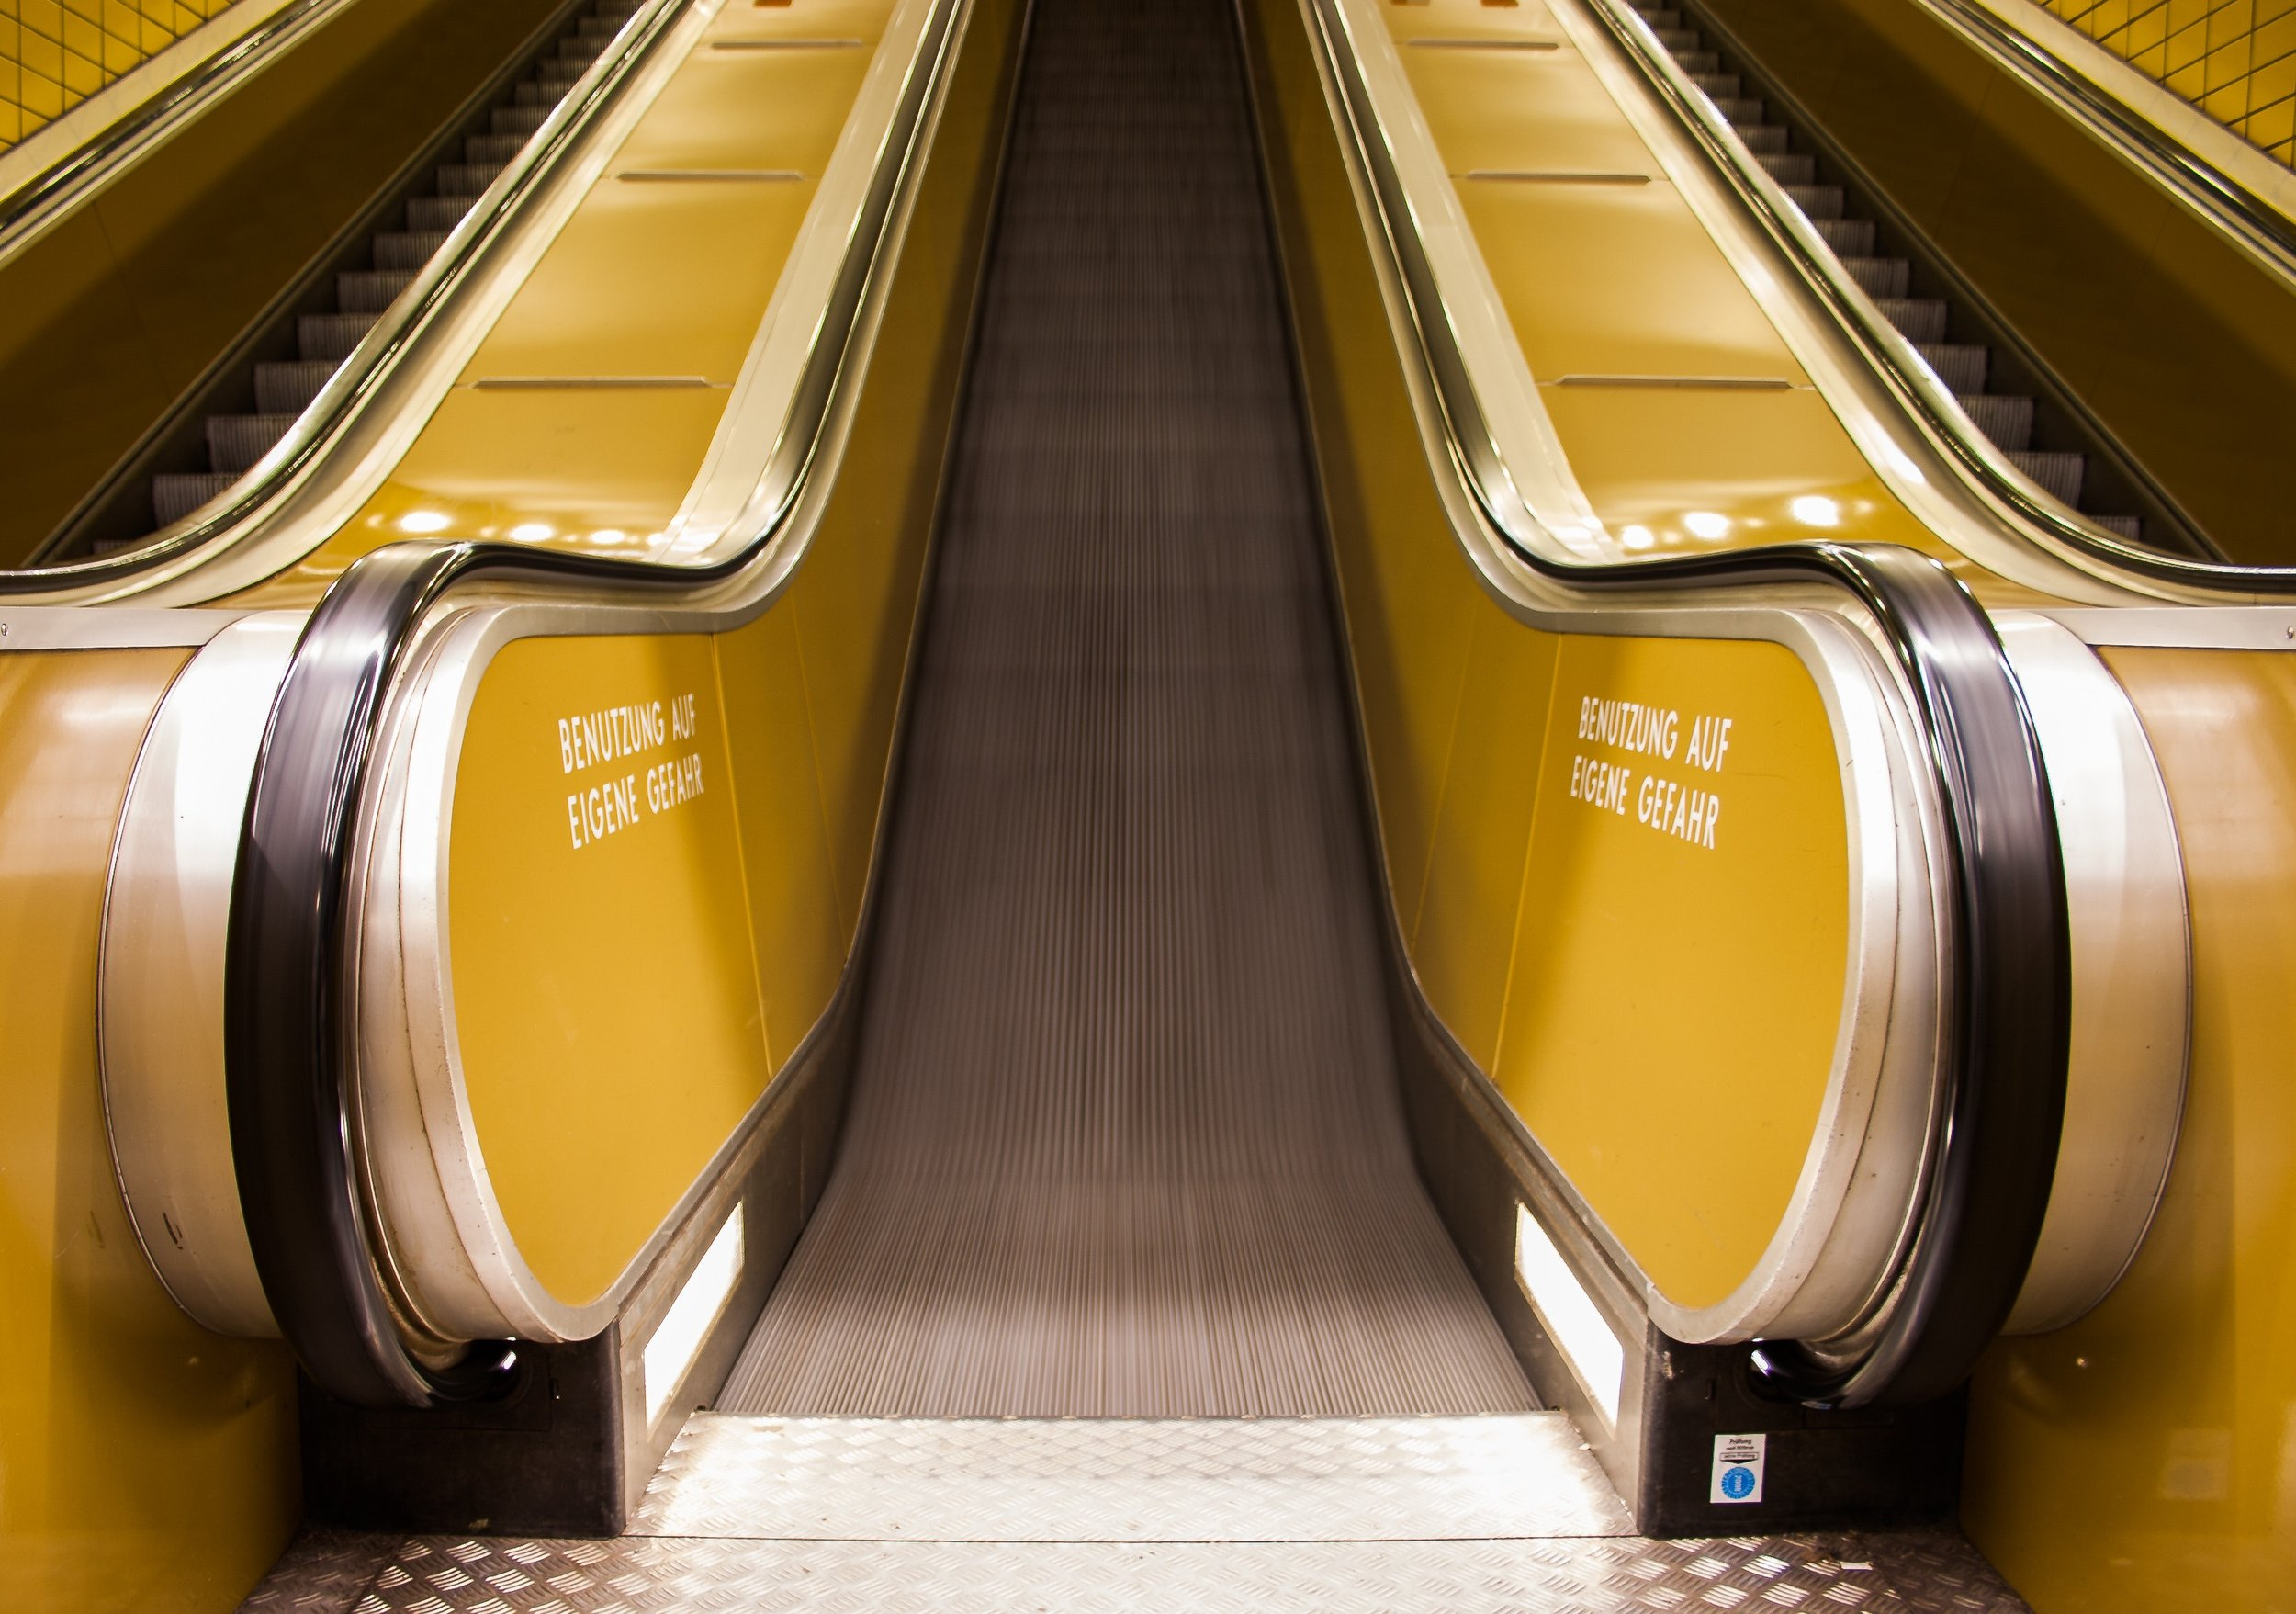 chrome-empty-escalator-920715.jpg